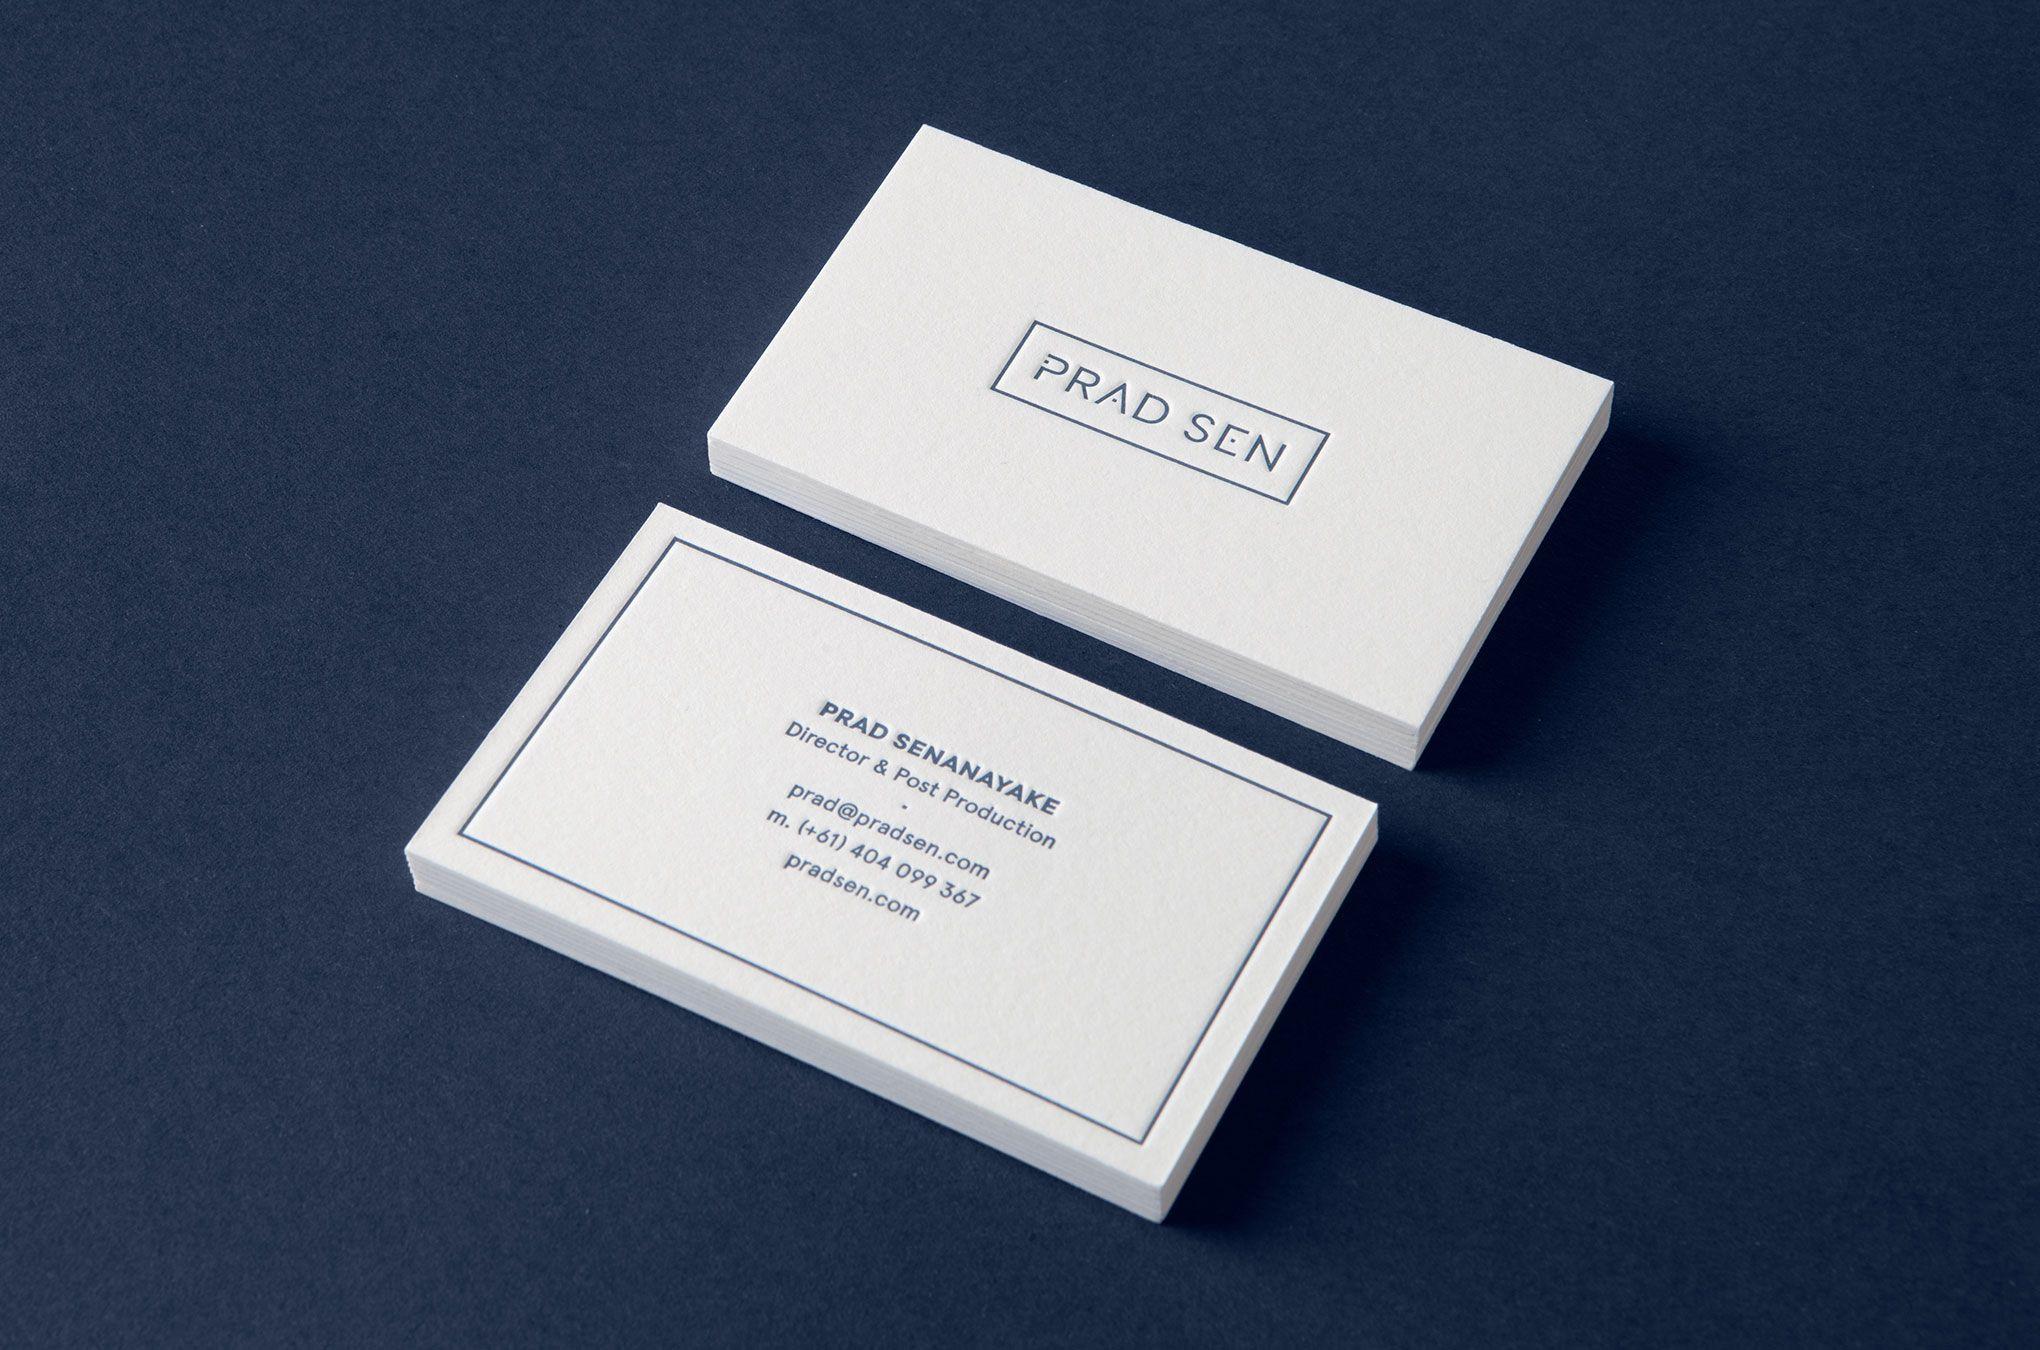 Prad Sen business card designed by Shorthand.